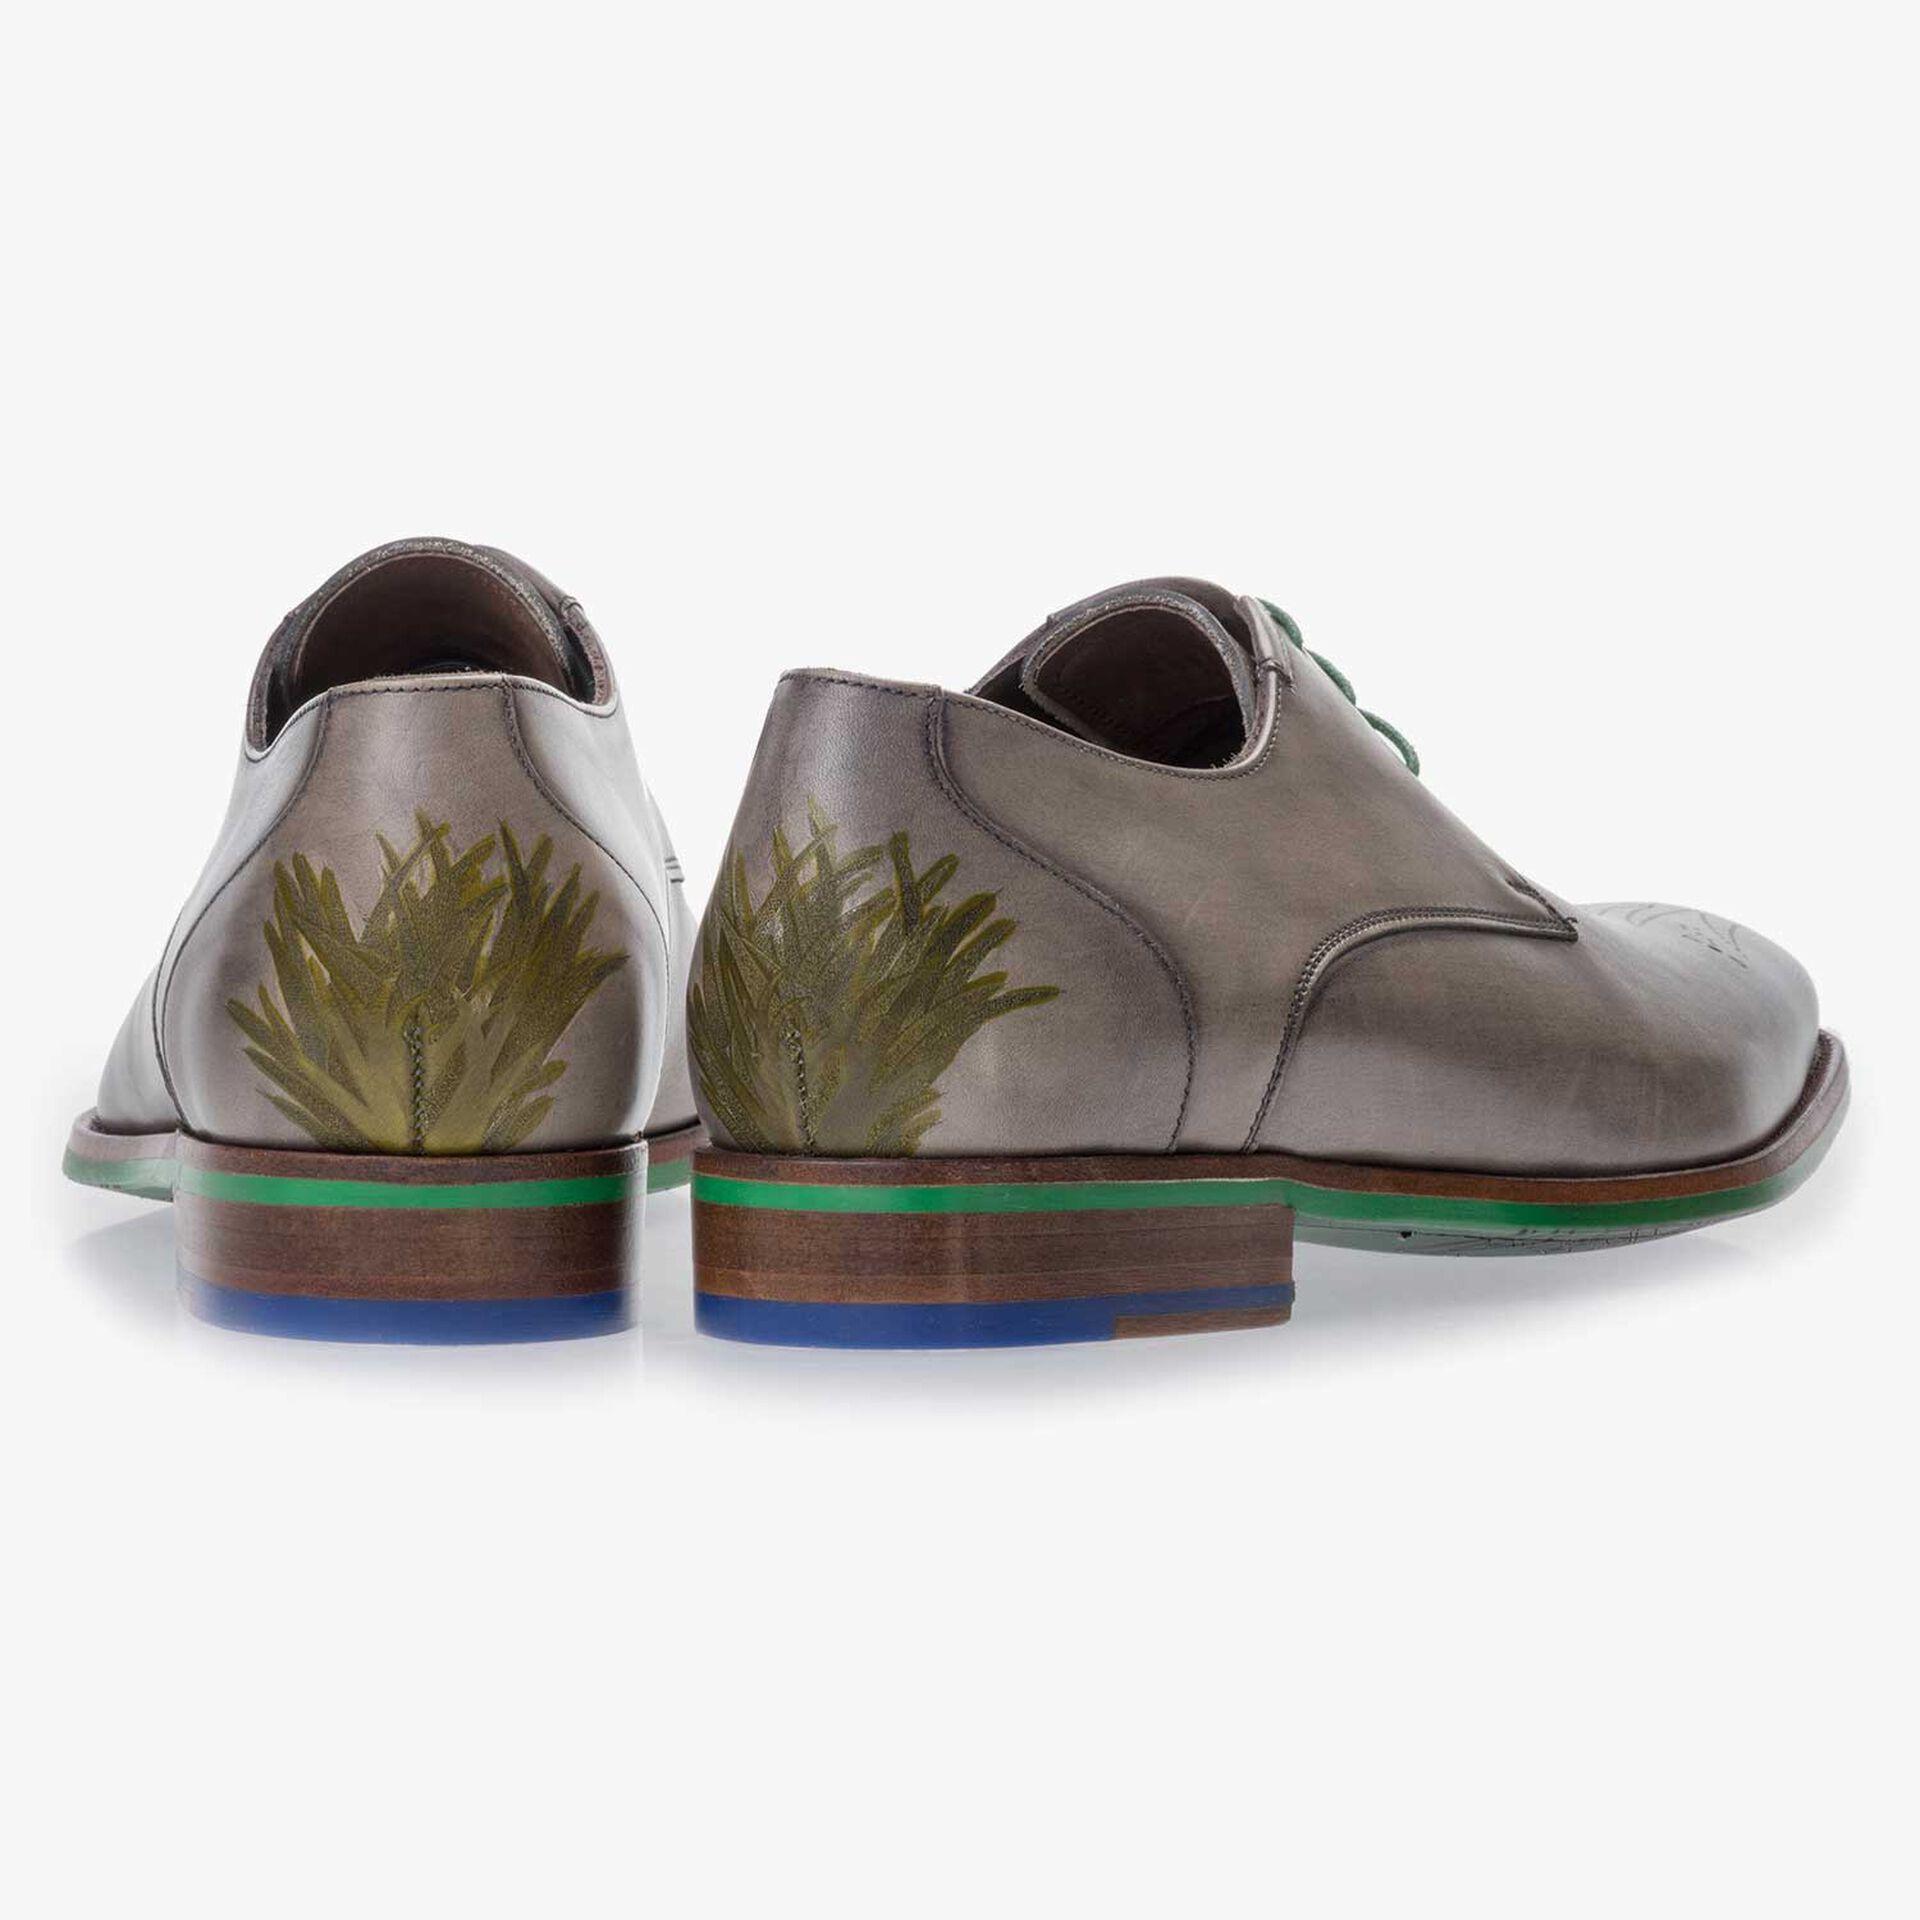 Taupe-coloured leather lace shoe